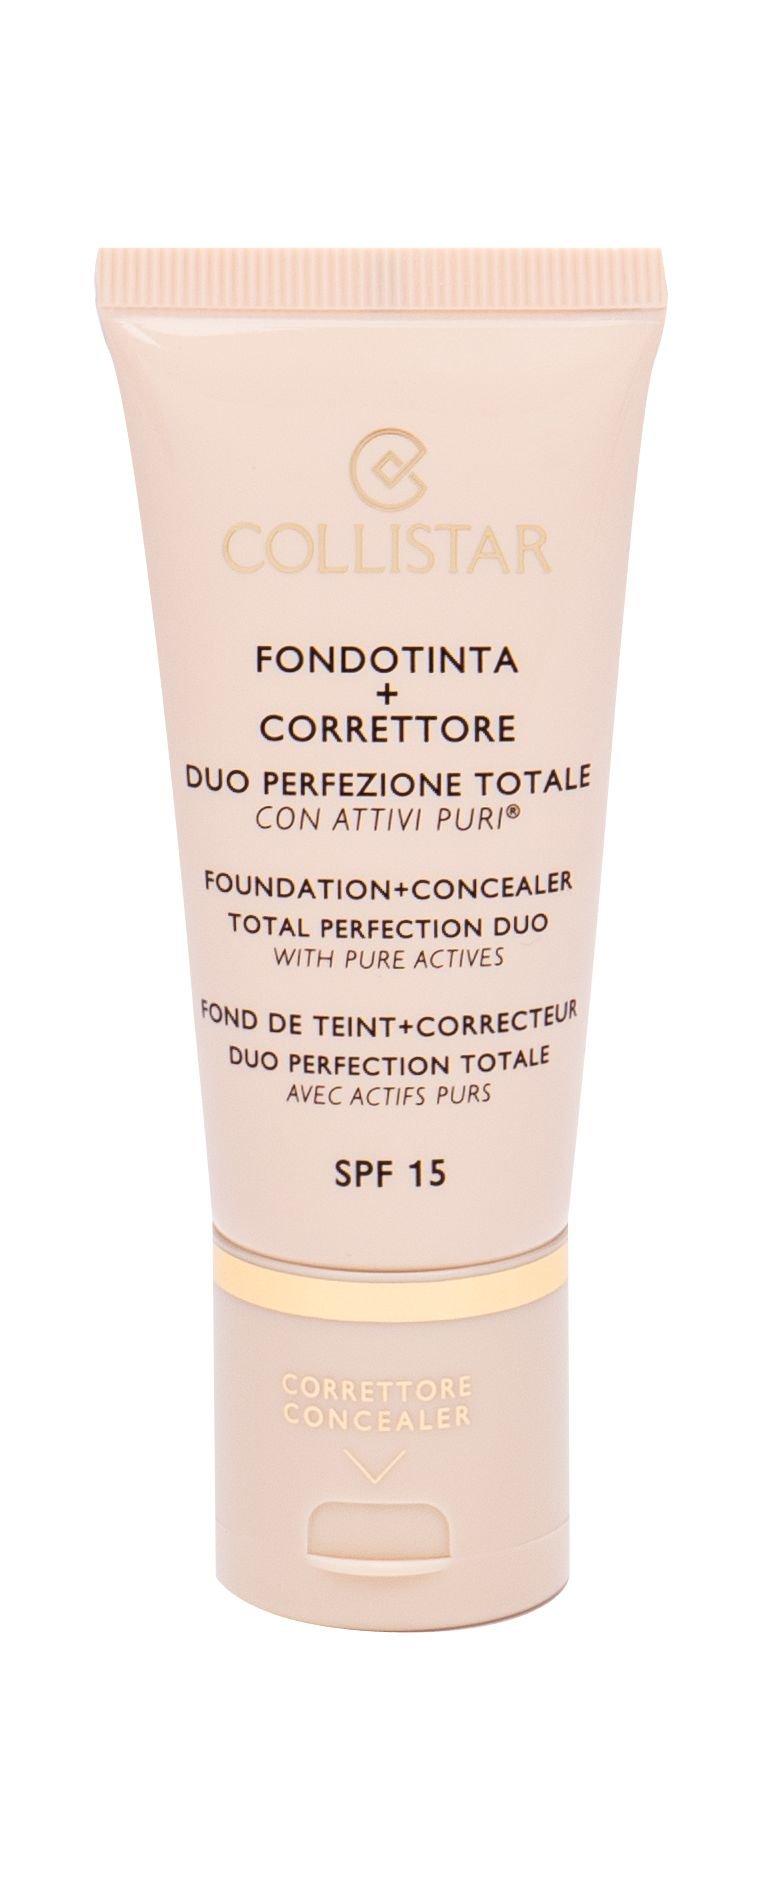 Collistar Foundation + Concealer Makeup 30ml 1